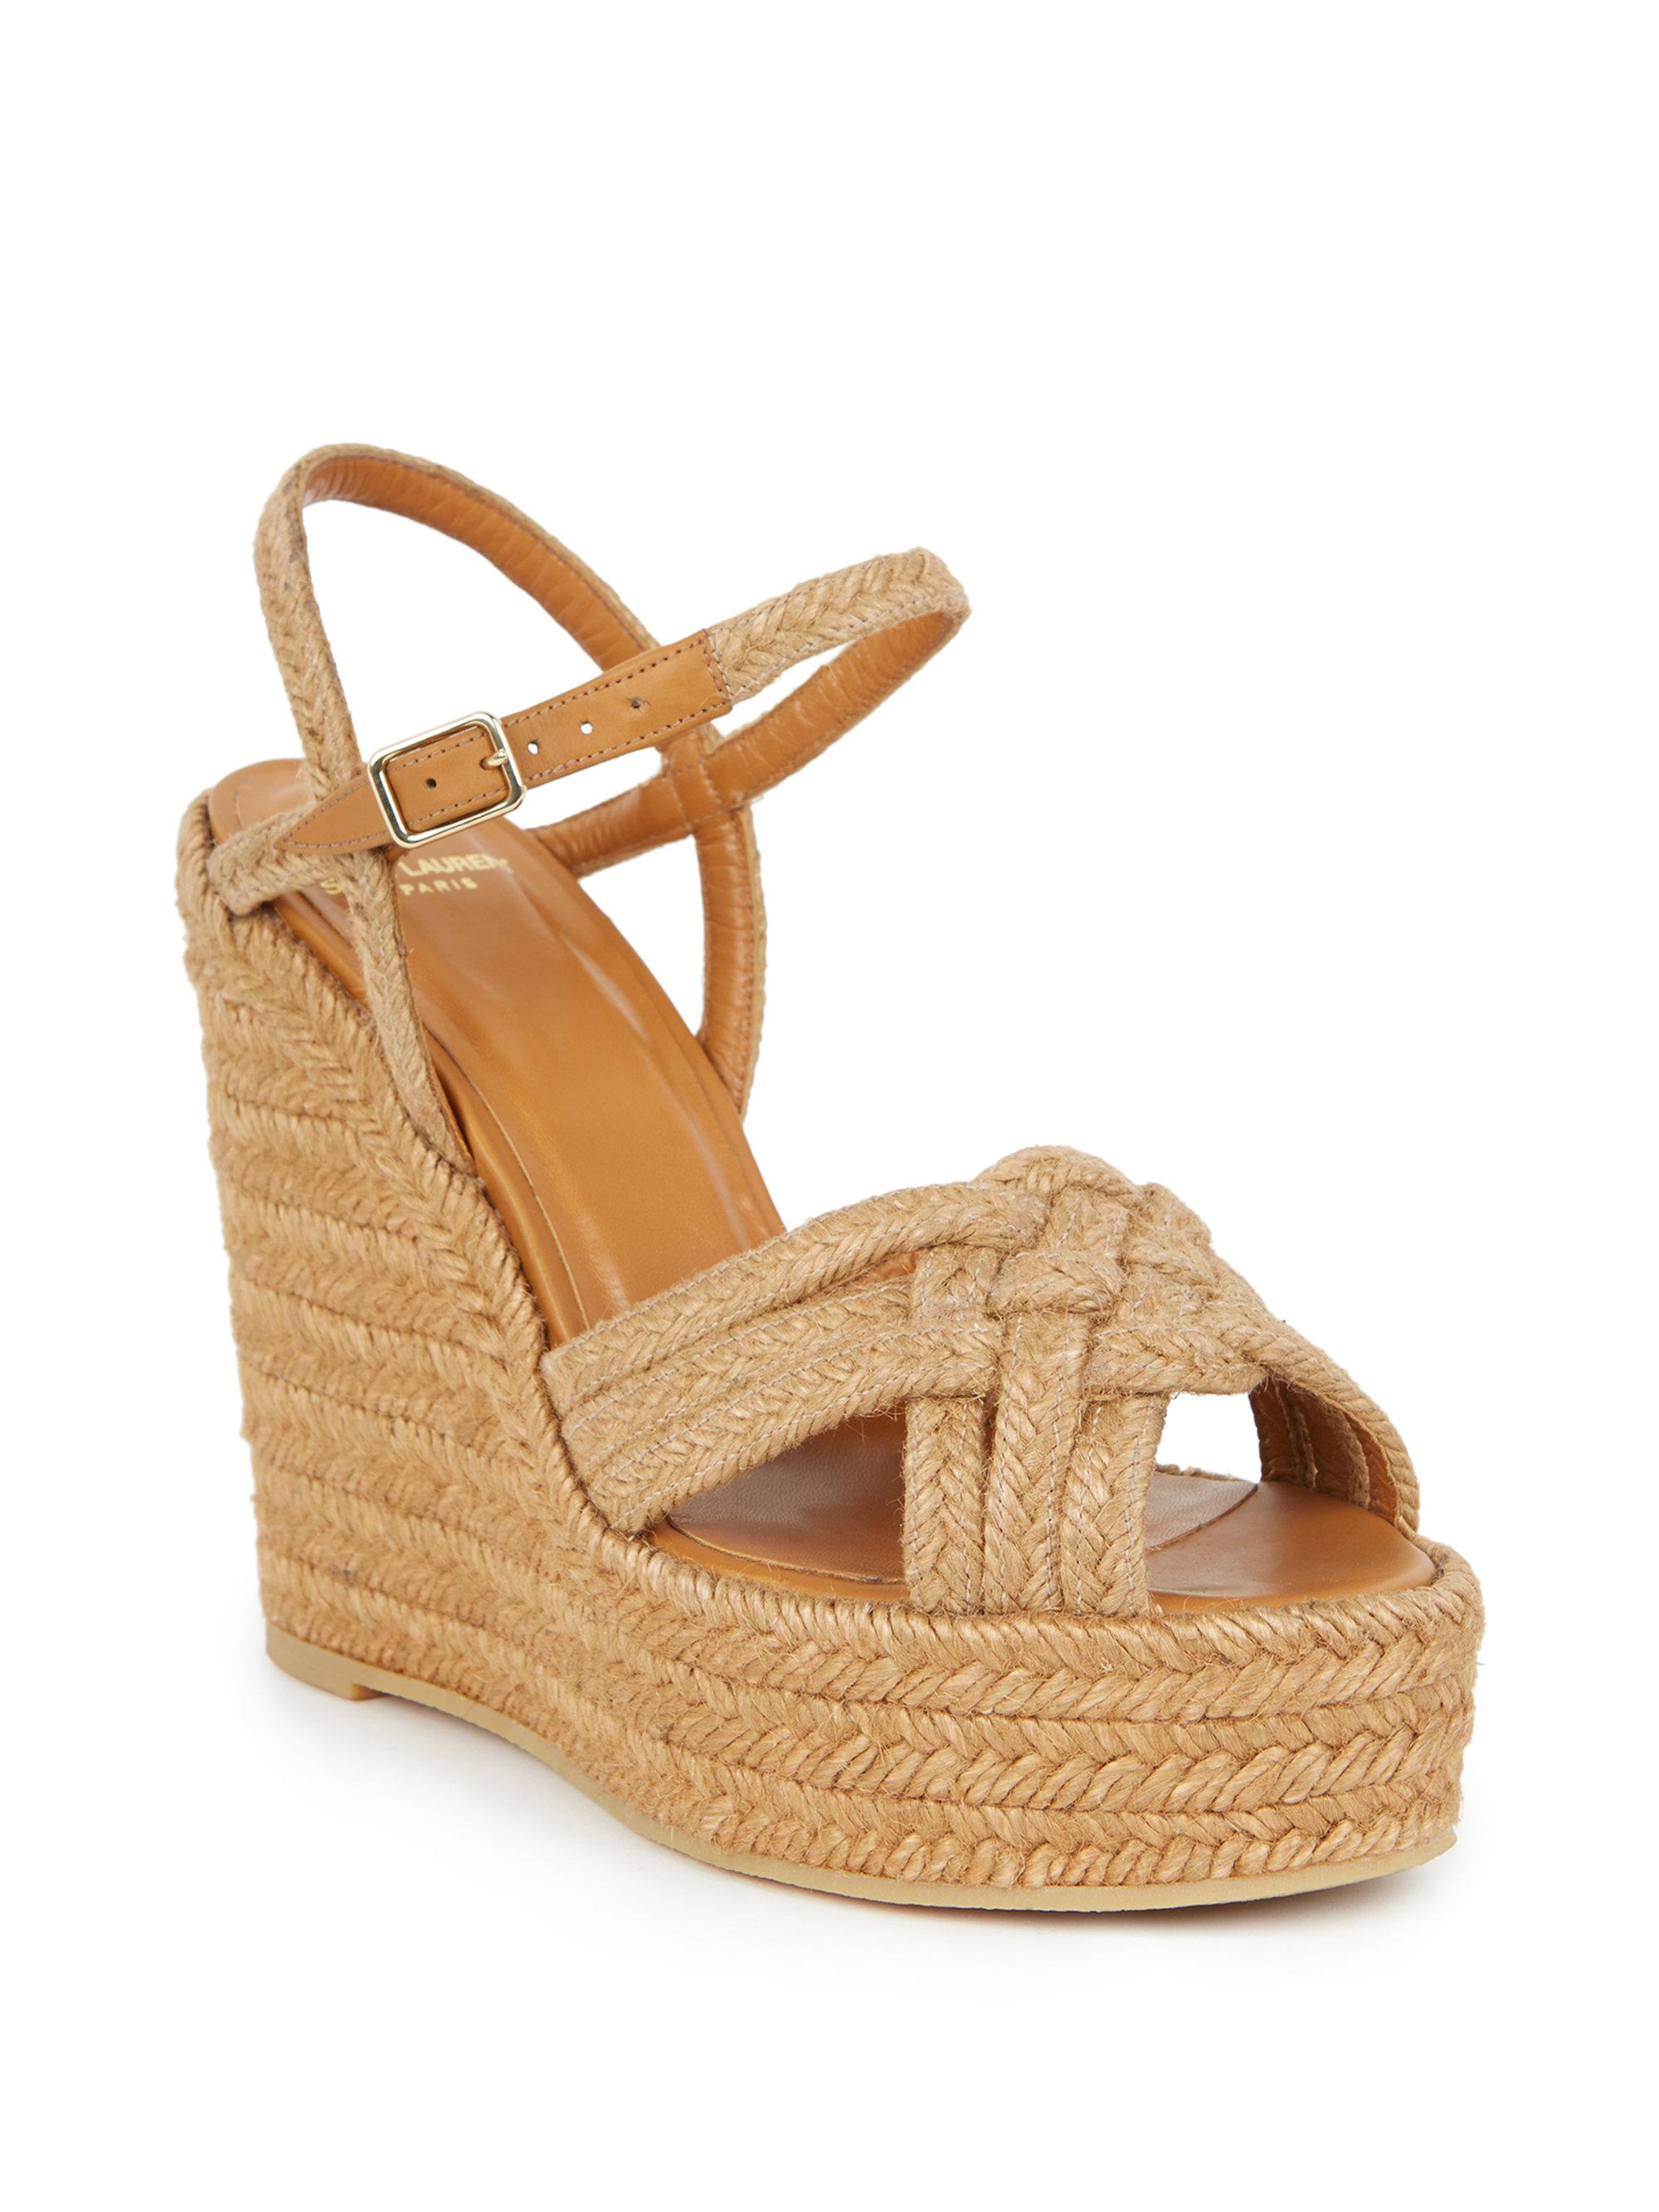 9092c7234b4 Lyst - Saint Laurent Woven Espadrille Wedge Sandals in Brown